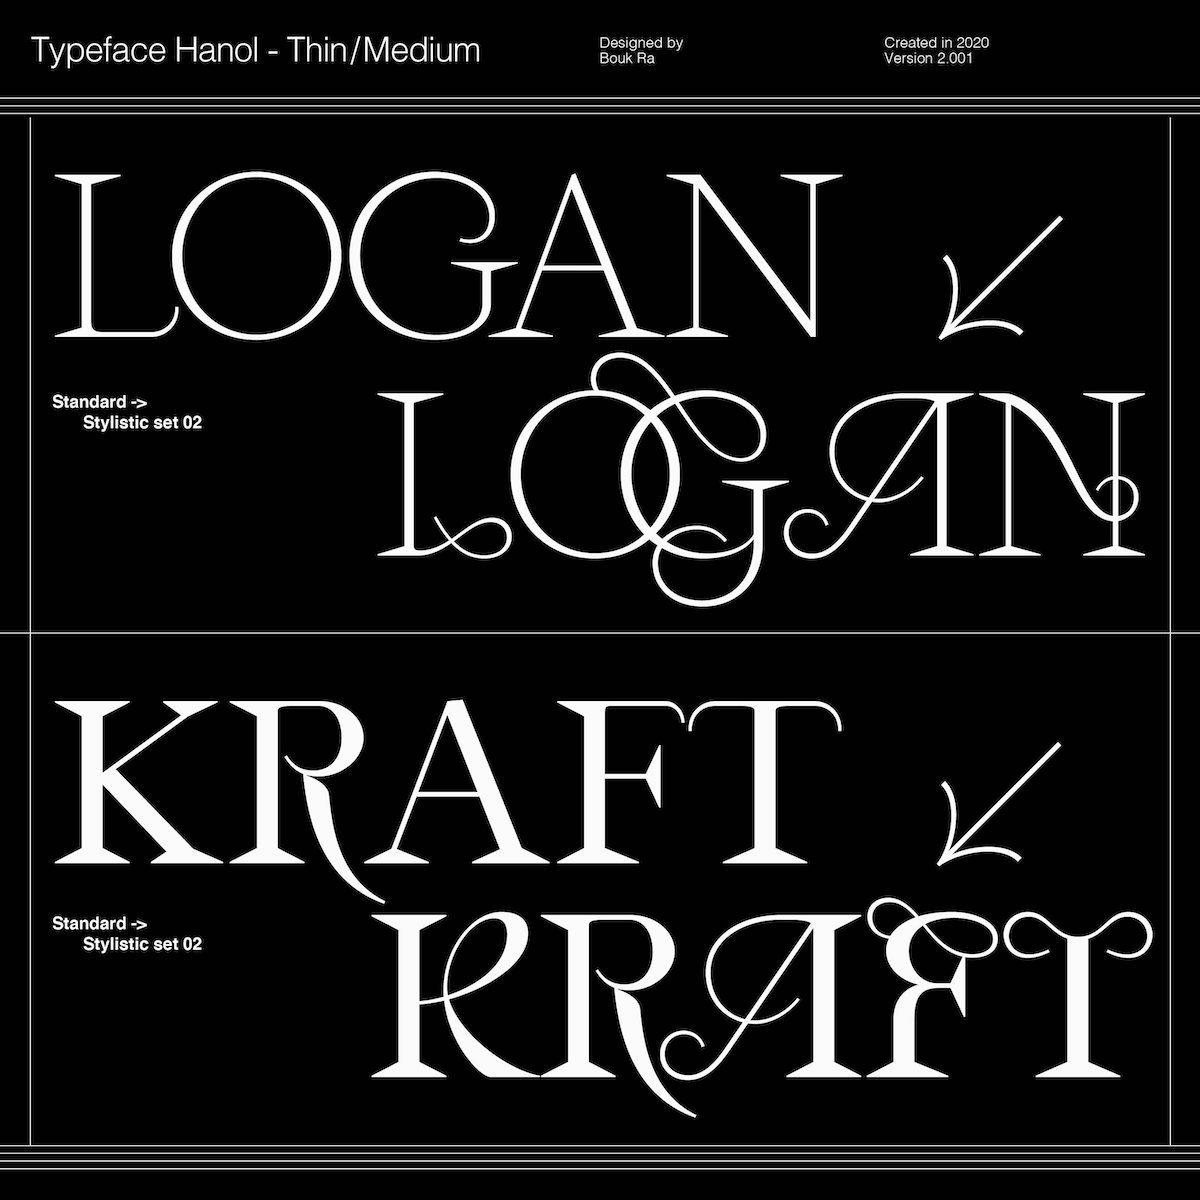 Hanol V.2 Typeface - Thin/Medium weights, stylistic set 02